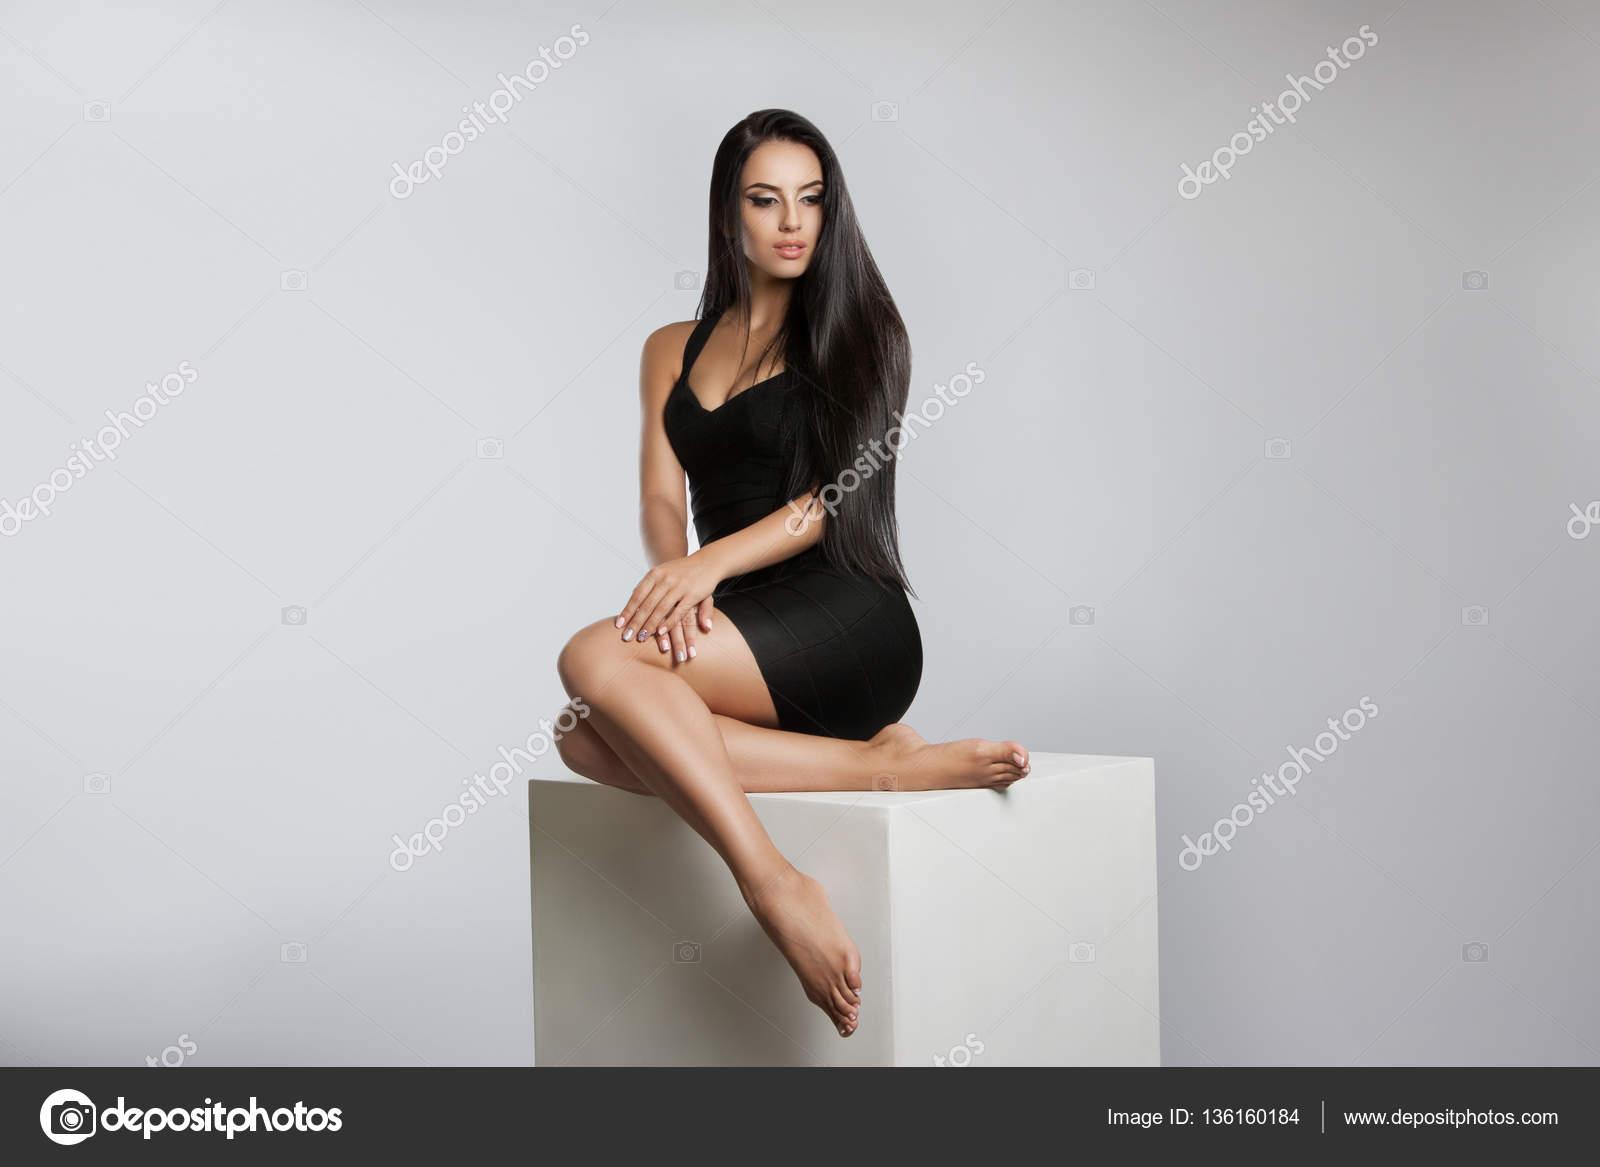 Девушка позирует флто фото 18-37